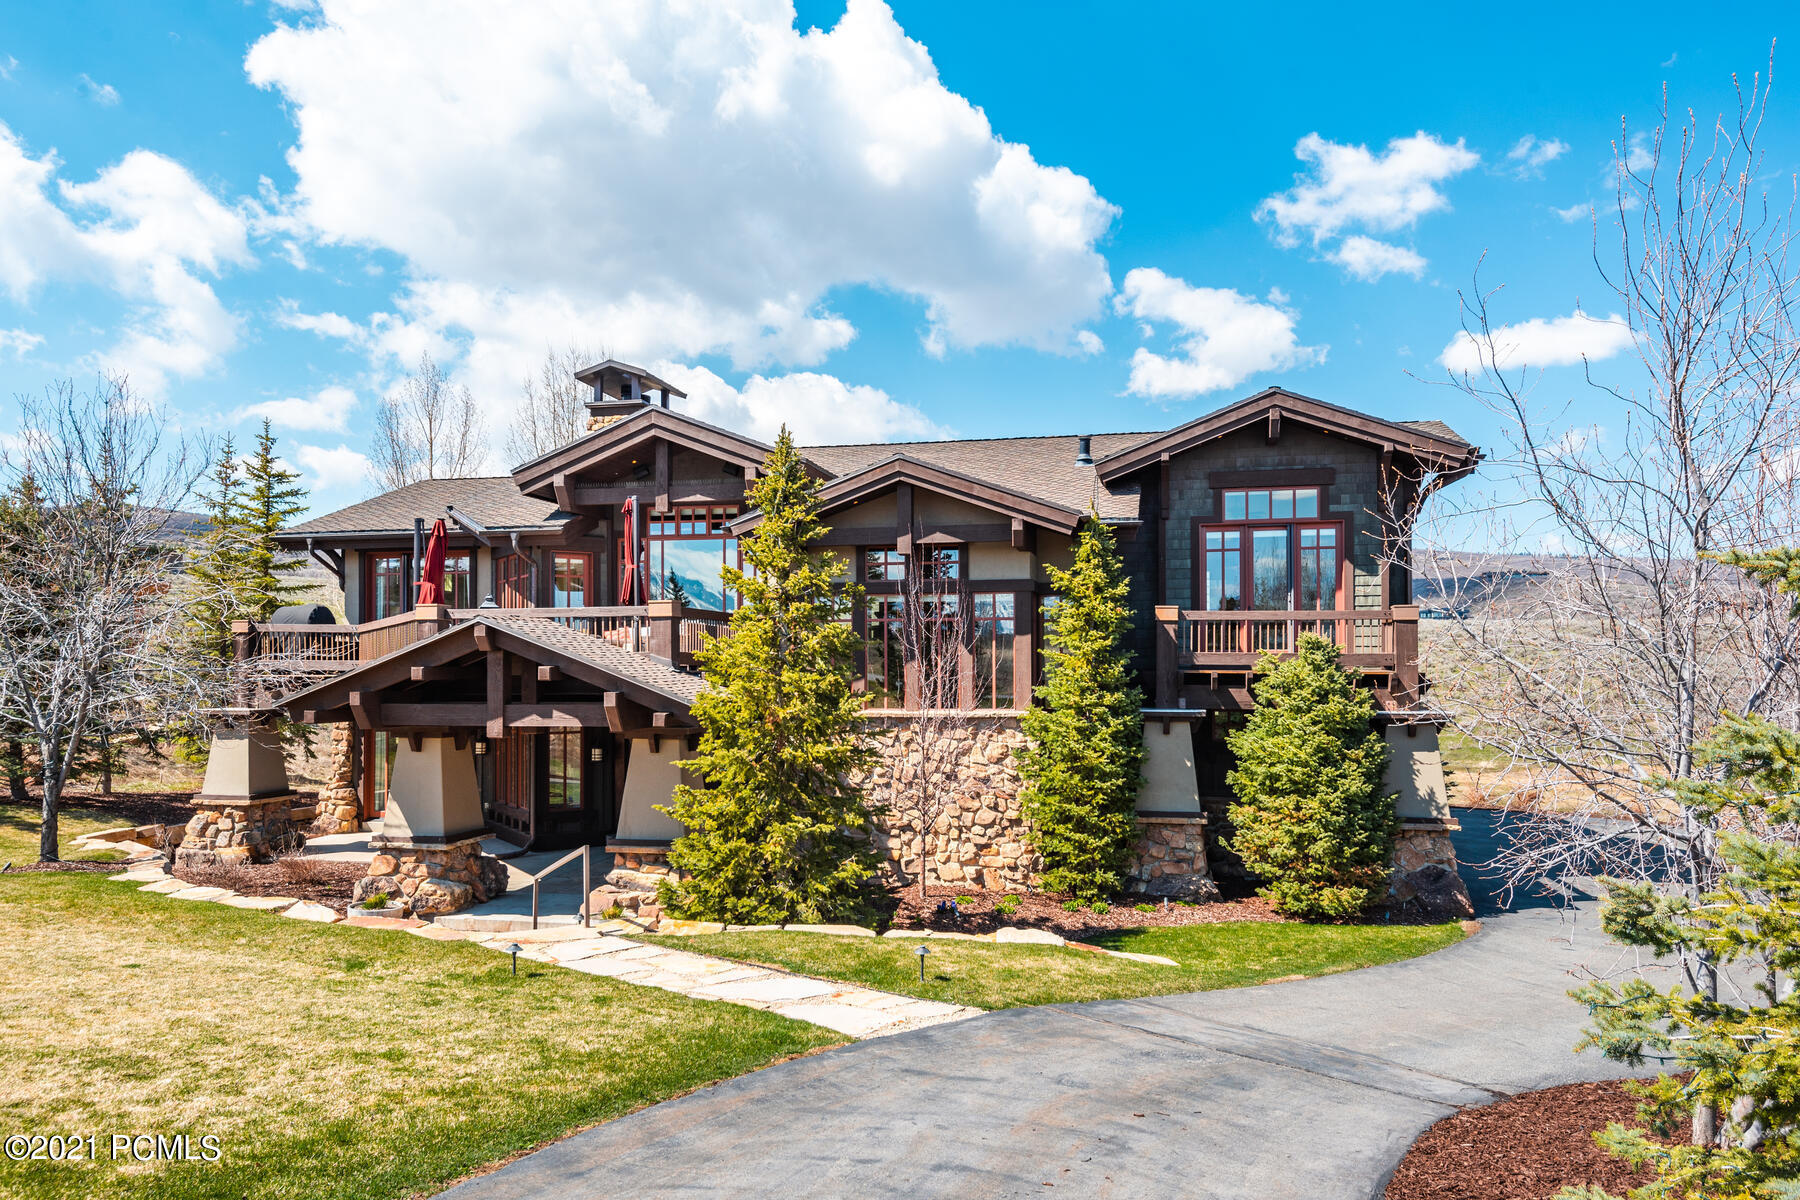 7994 Glenwild Drive, Park City, Utah 84098, 4 Bedrooms Bedrooms, ,5 BathroomsBathrooms,Single Family,For Sale,Glenwild,12101689